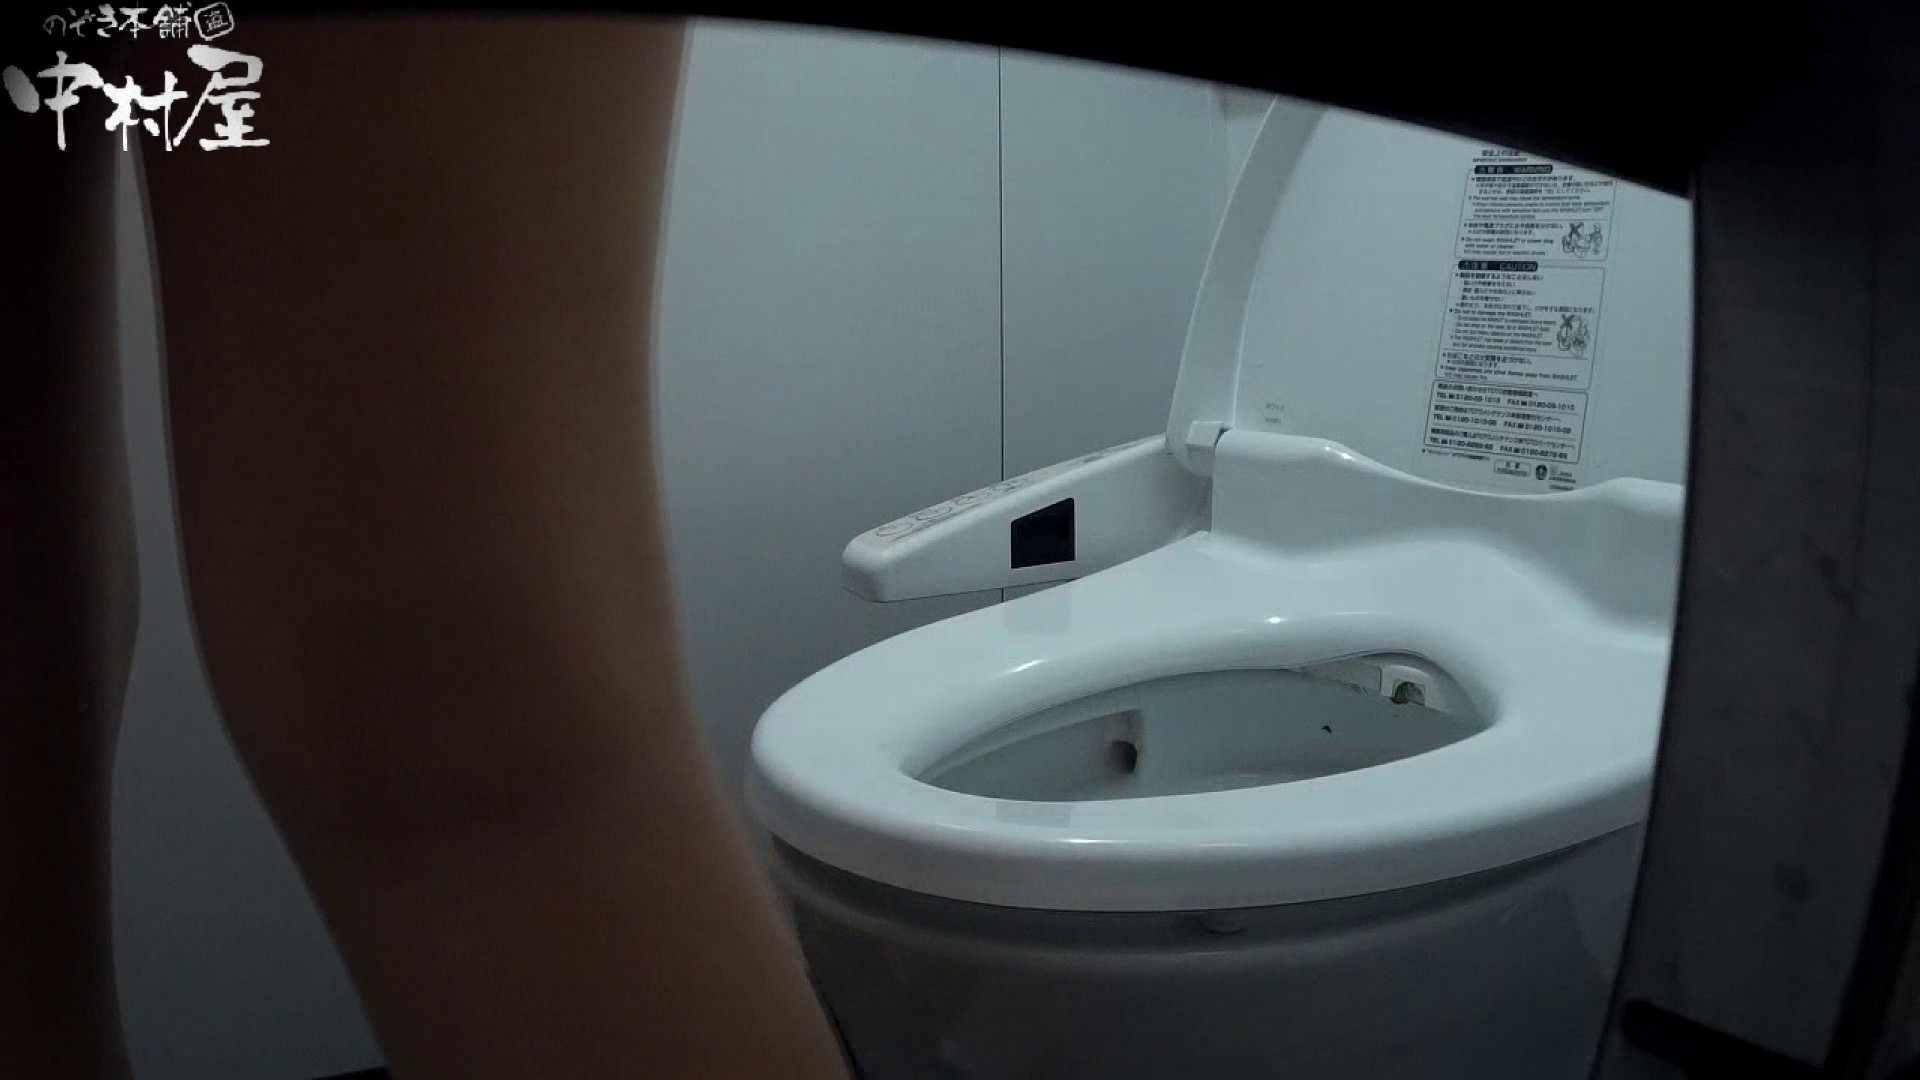 【某有名大学女性洗面所】有名大学女性洗面所 vol.35 安定の2カメ 最近の女性は保守的な下着が多め? 下着   潜入画像  83画像 6